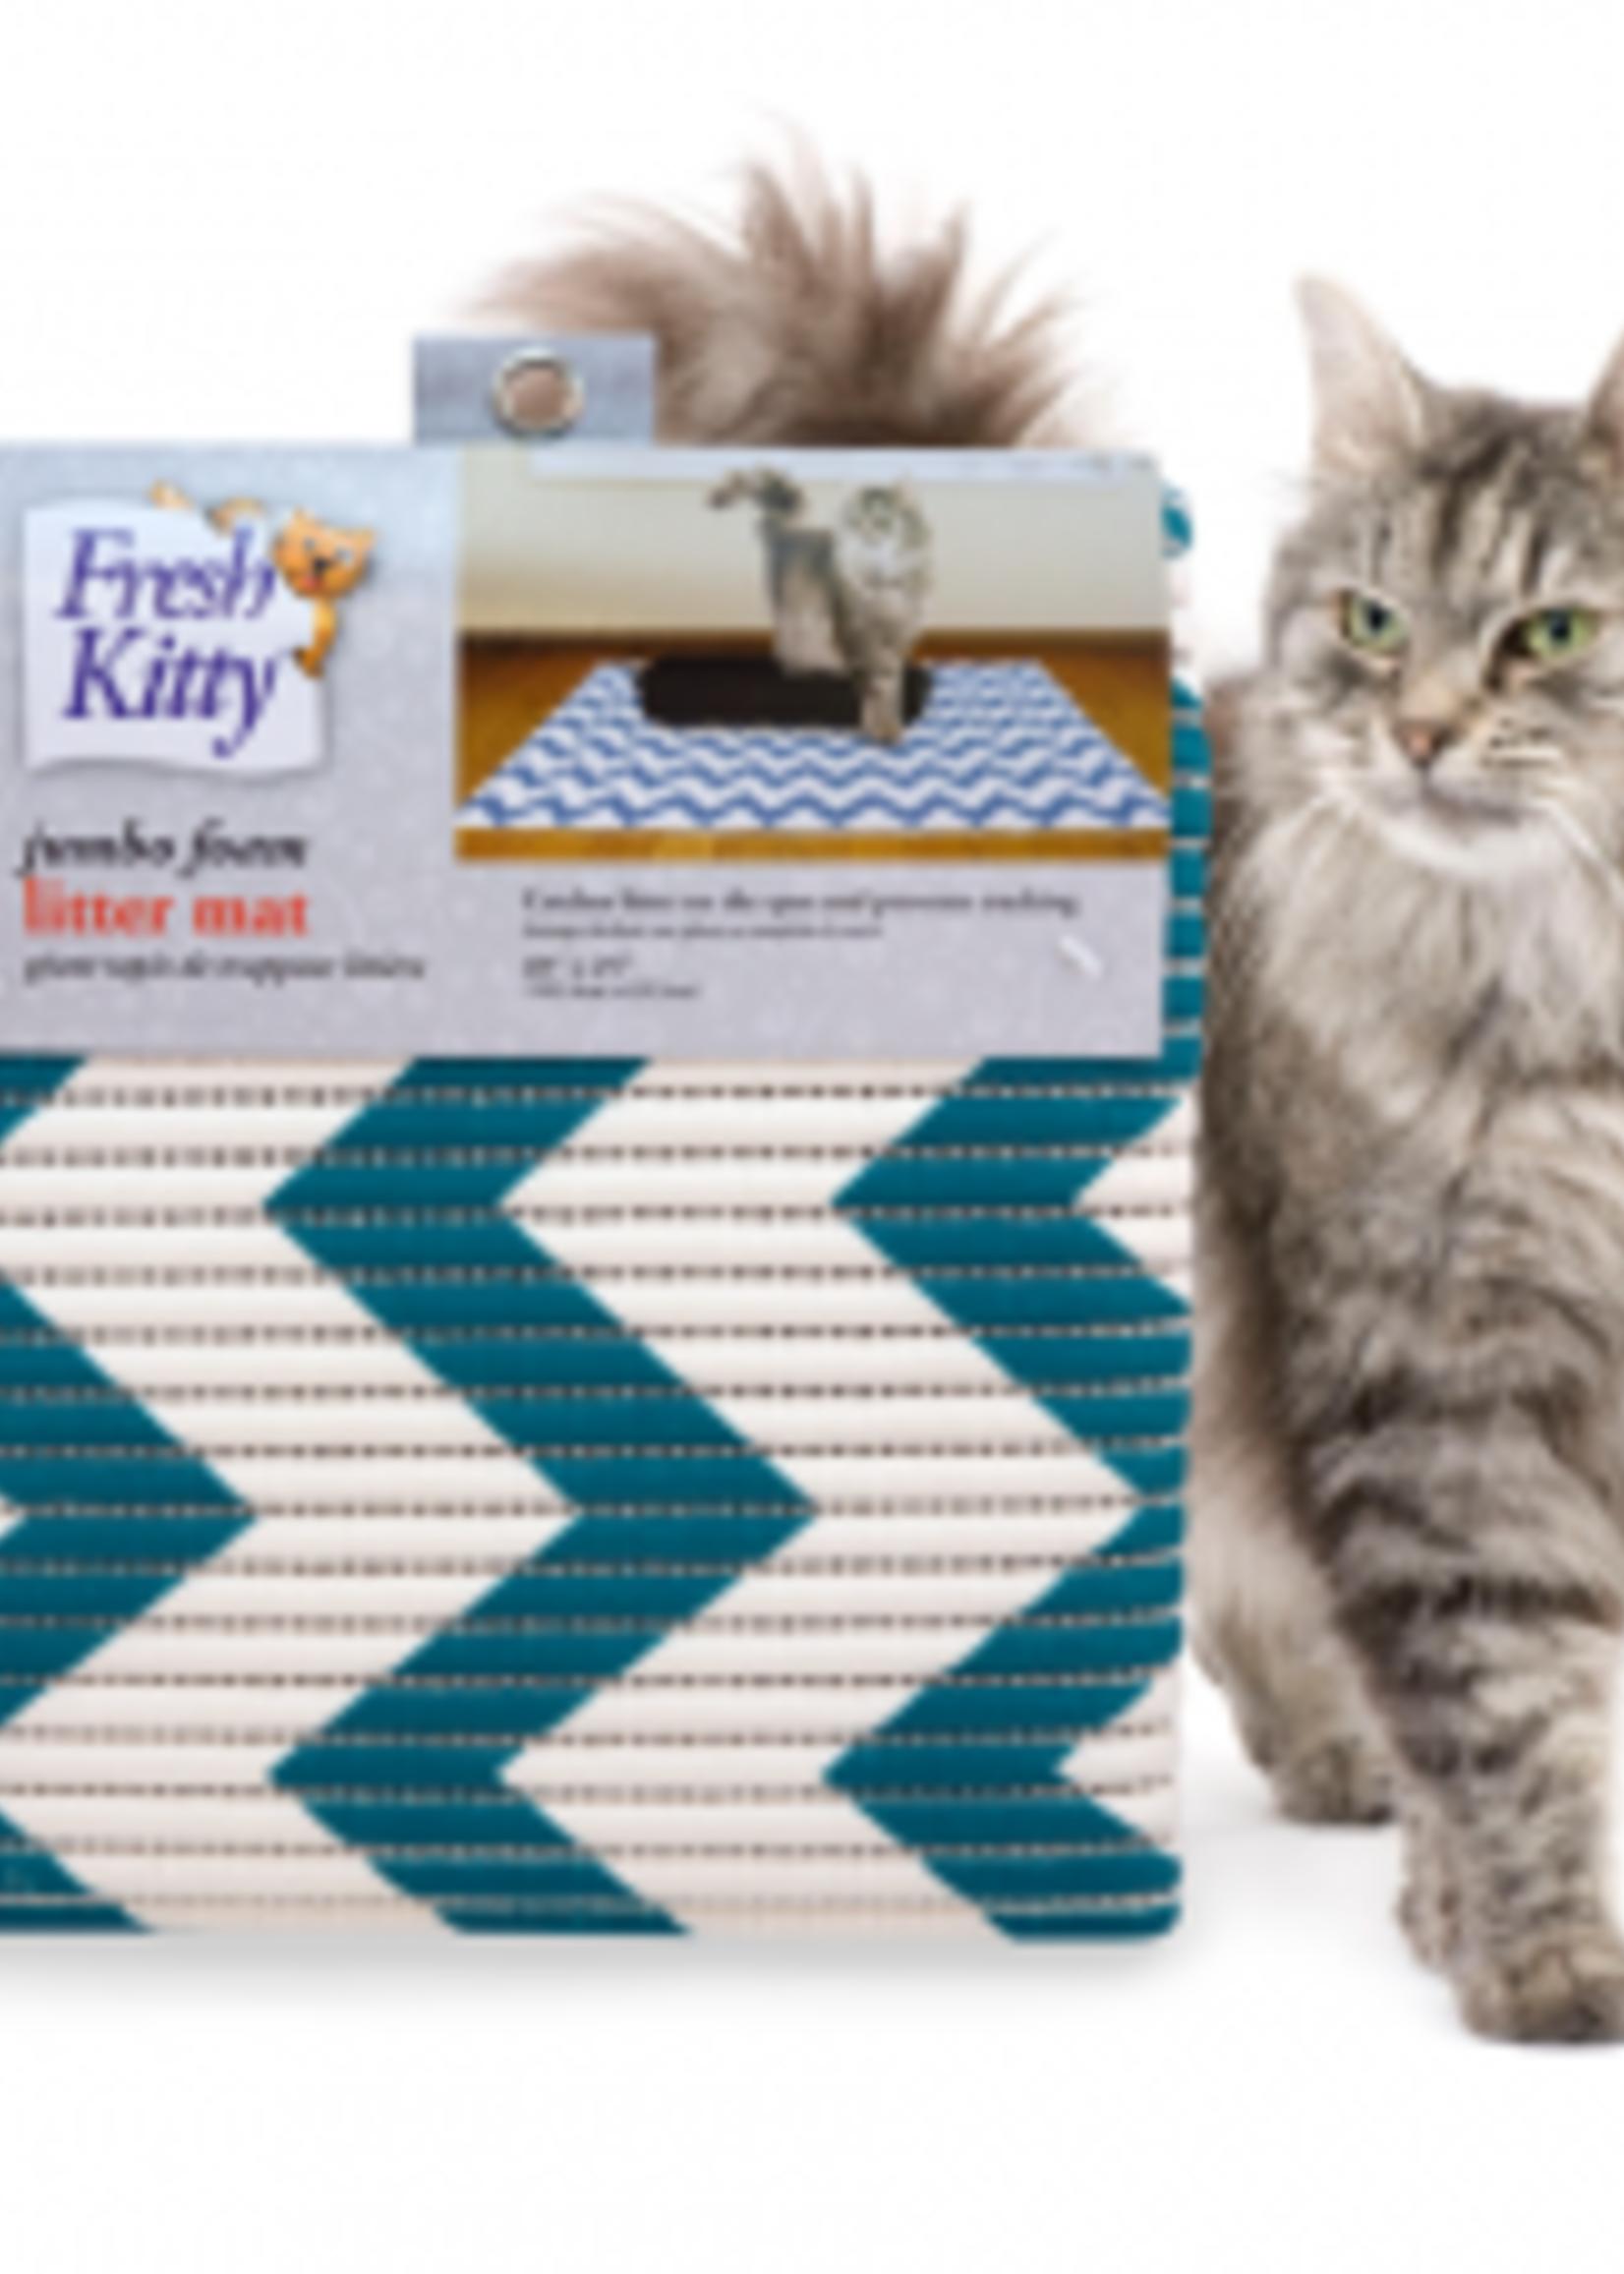 Fresh Kitty™ Fresh Kitty™ Jumbo Foam Litter Mat - Chevron